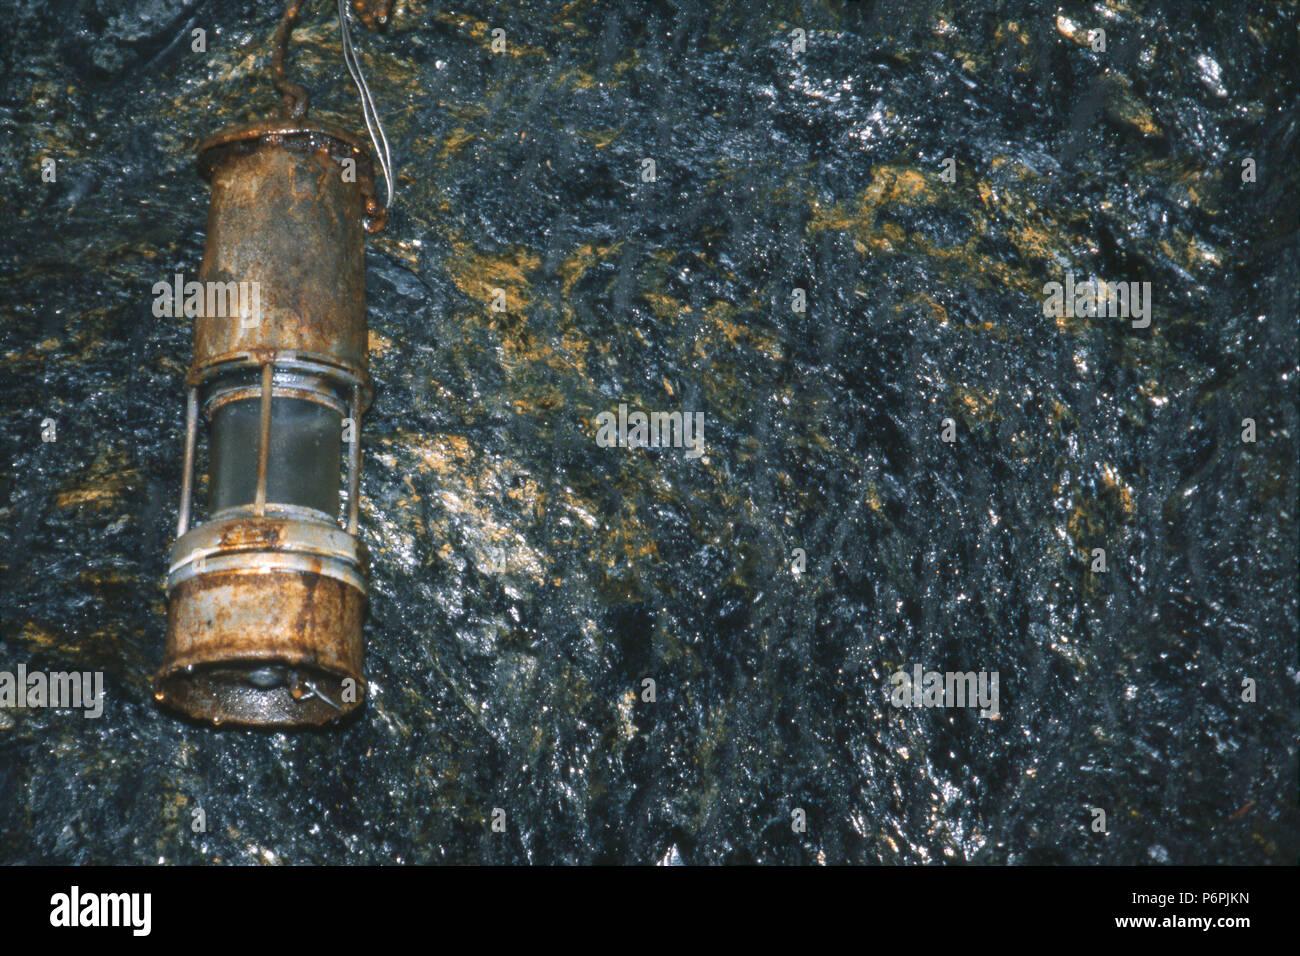 Coal miner's lamp in tunnel, Pioneer Coal Mine, Ashland, Pennsylvania. Photograph Stock Photo